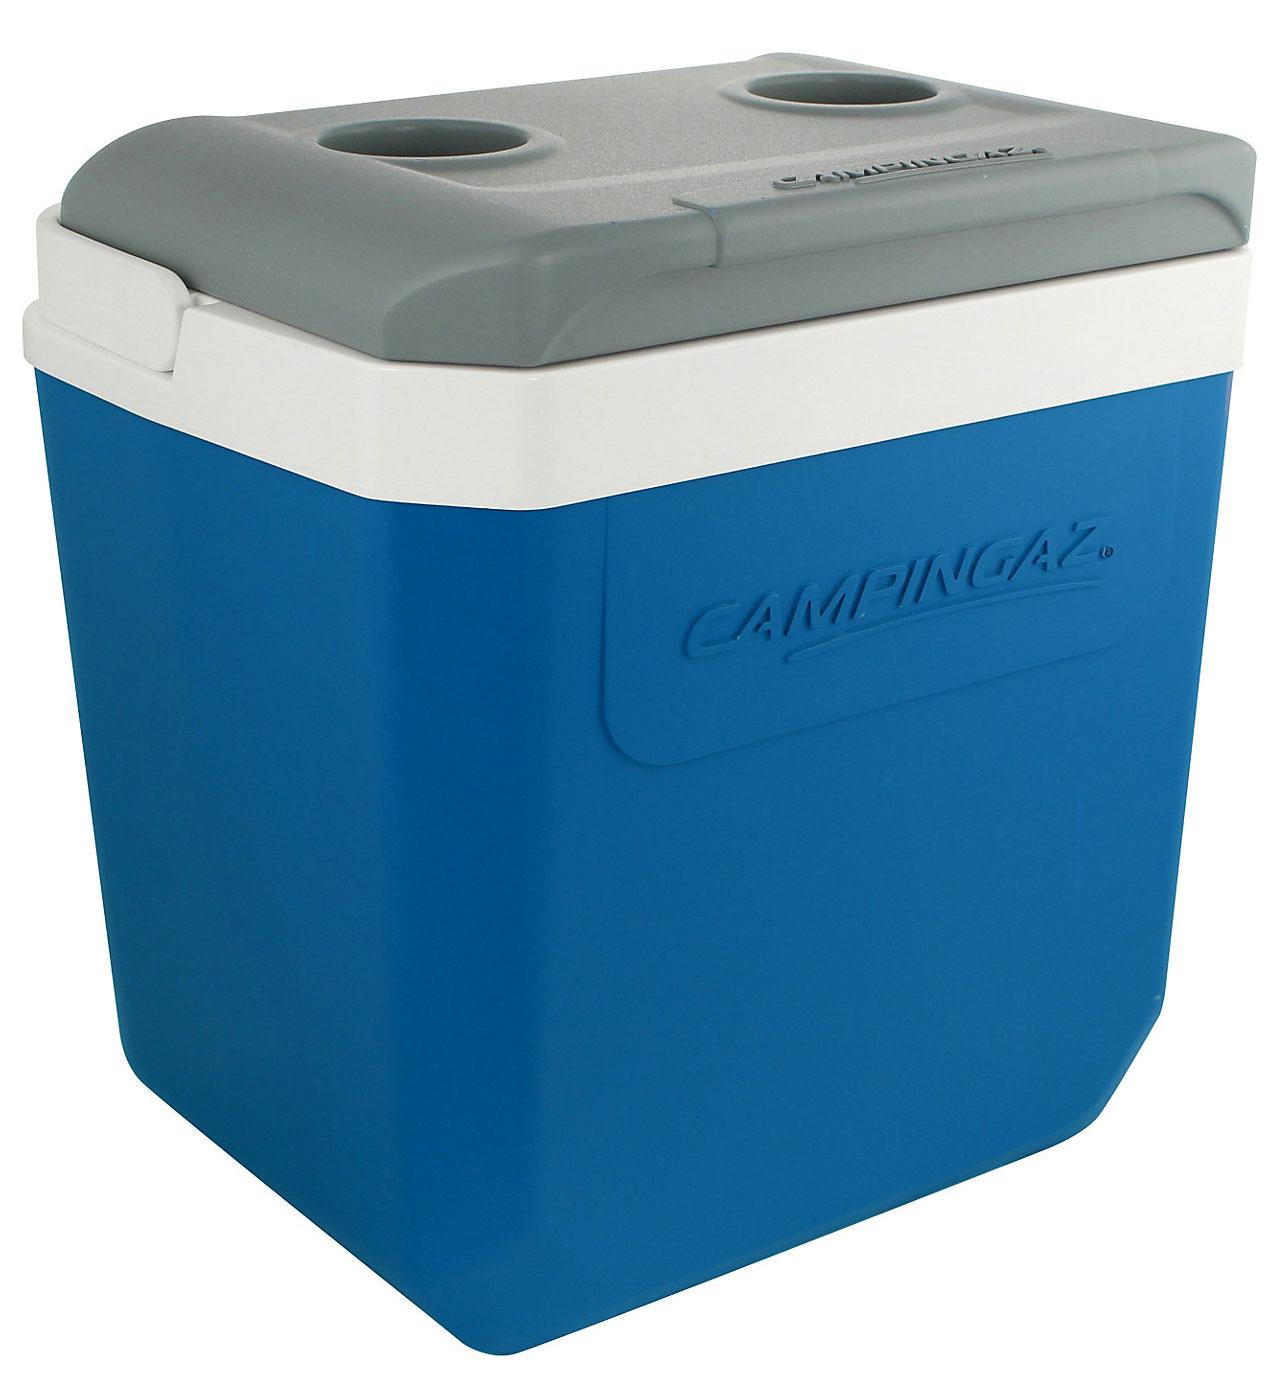 Campingaz Kühlbox Icetime Plus Extreme 25 Liter Bild 1